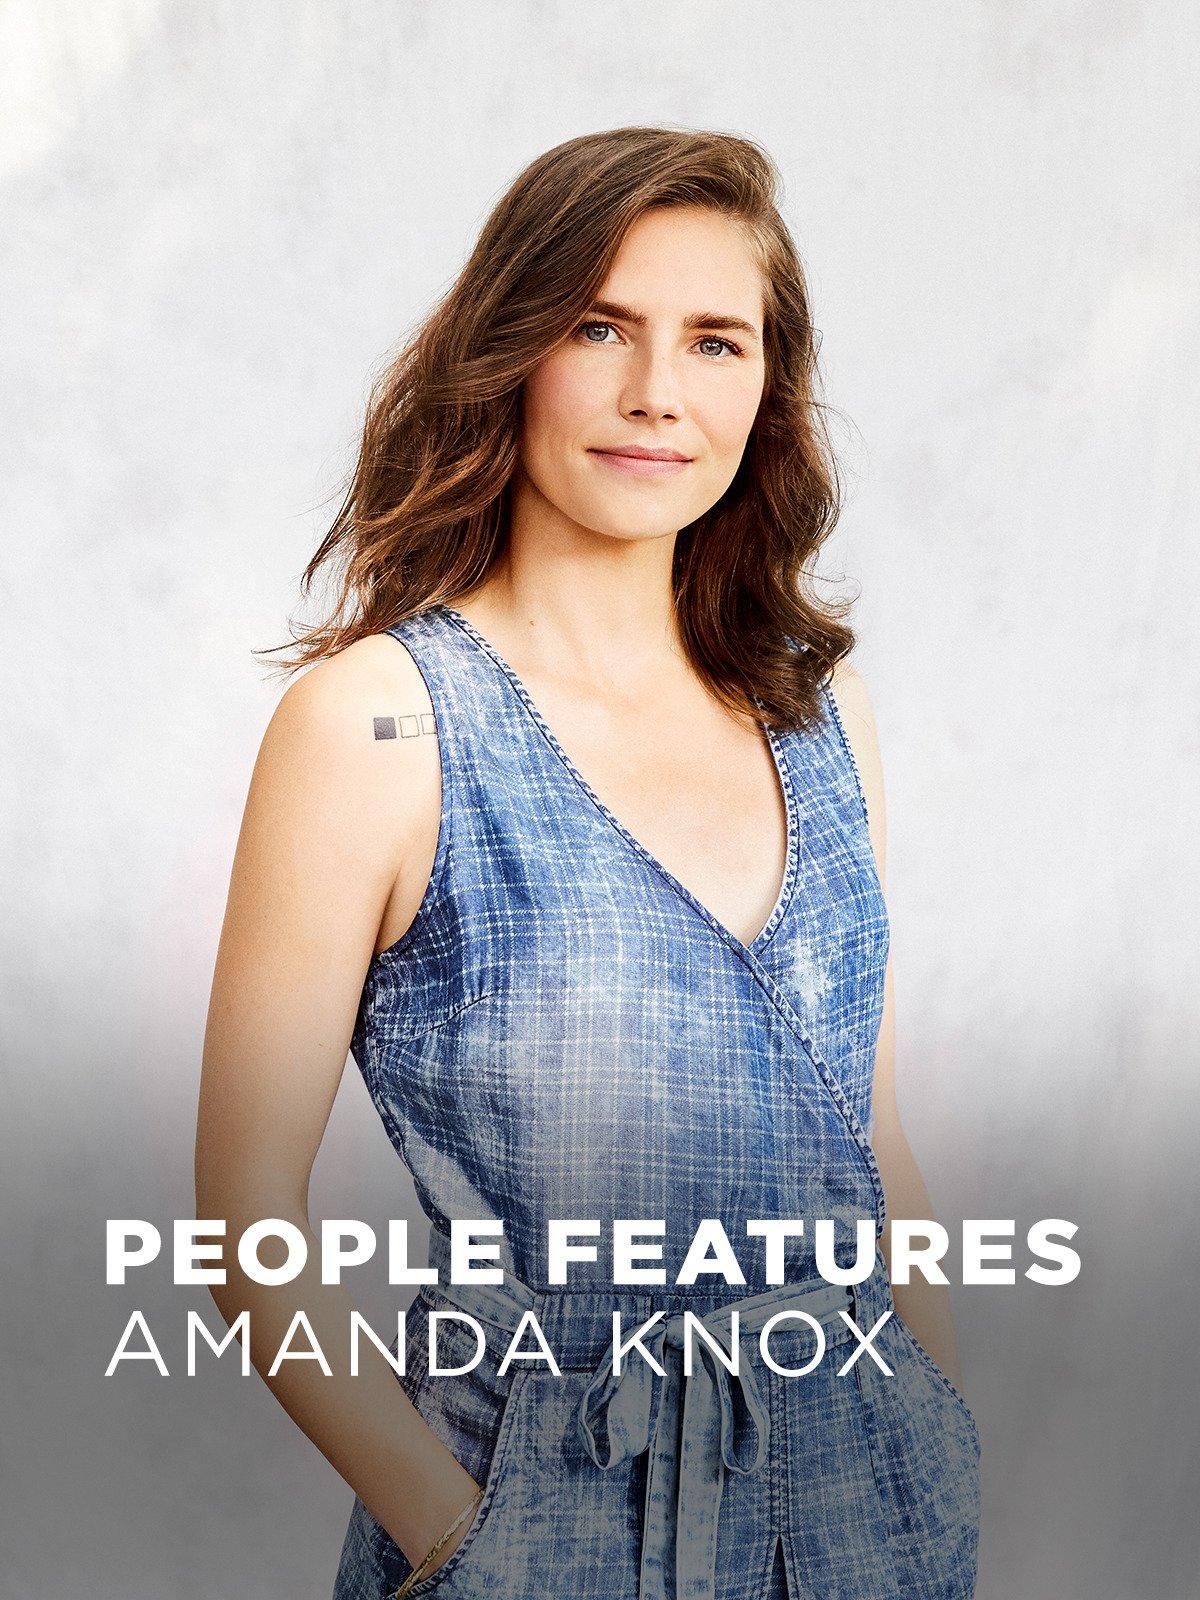 People Features: Amanda Knox